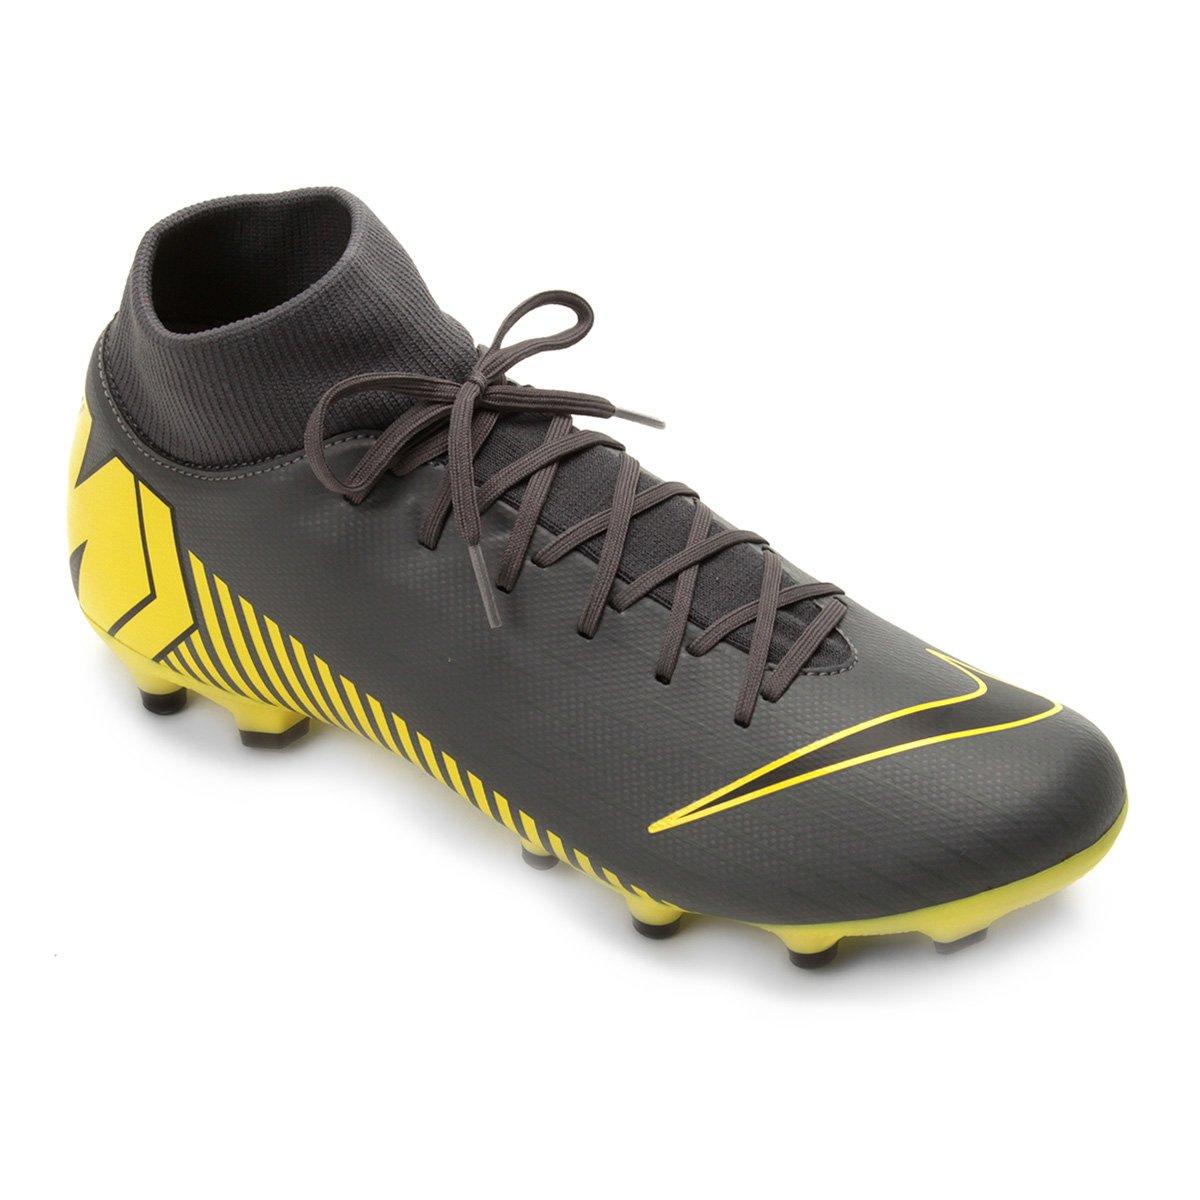 375bd5d026eac Chuteira Campo Nike Mercurial Superfly 6 Academy FG